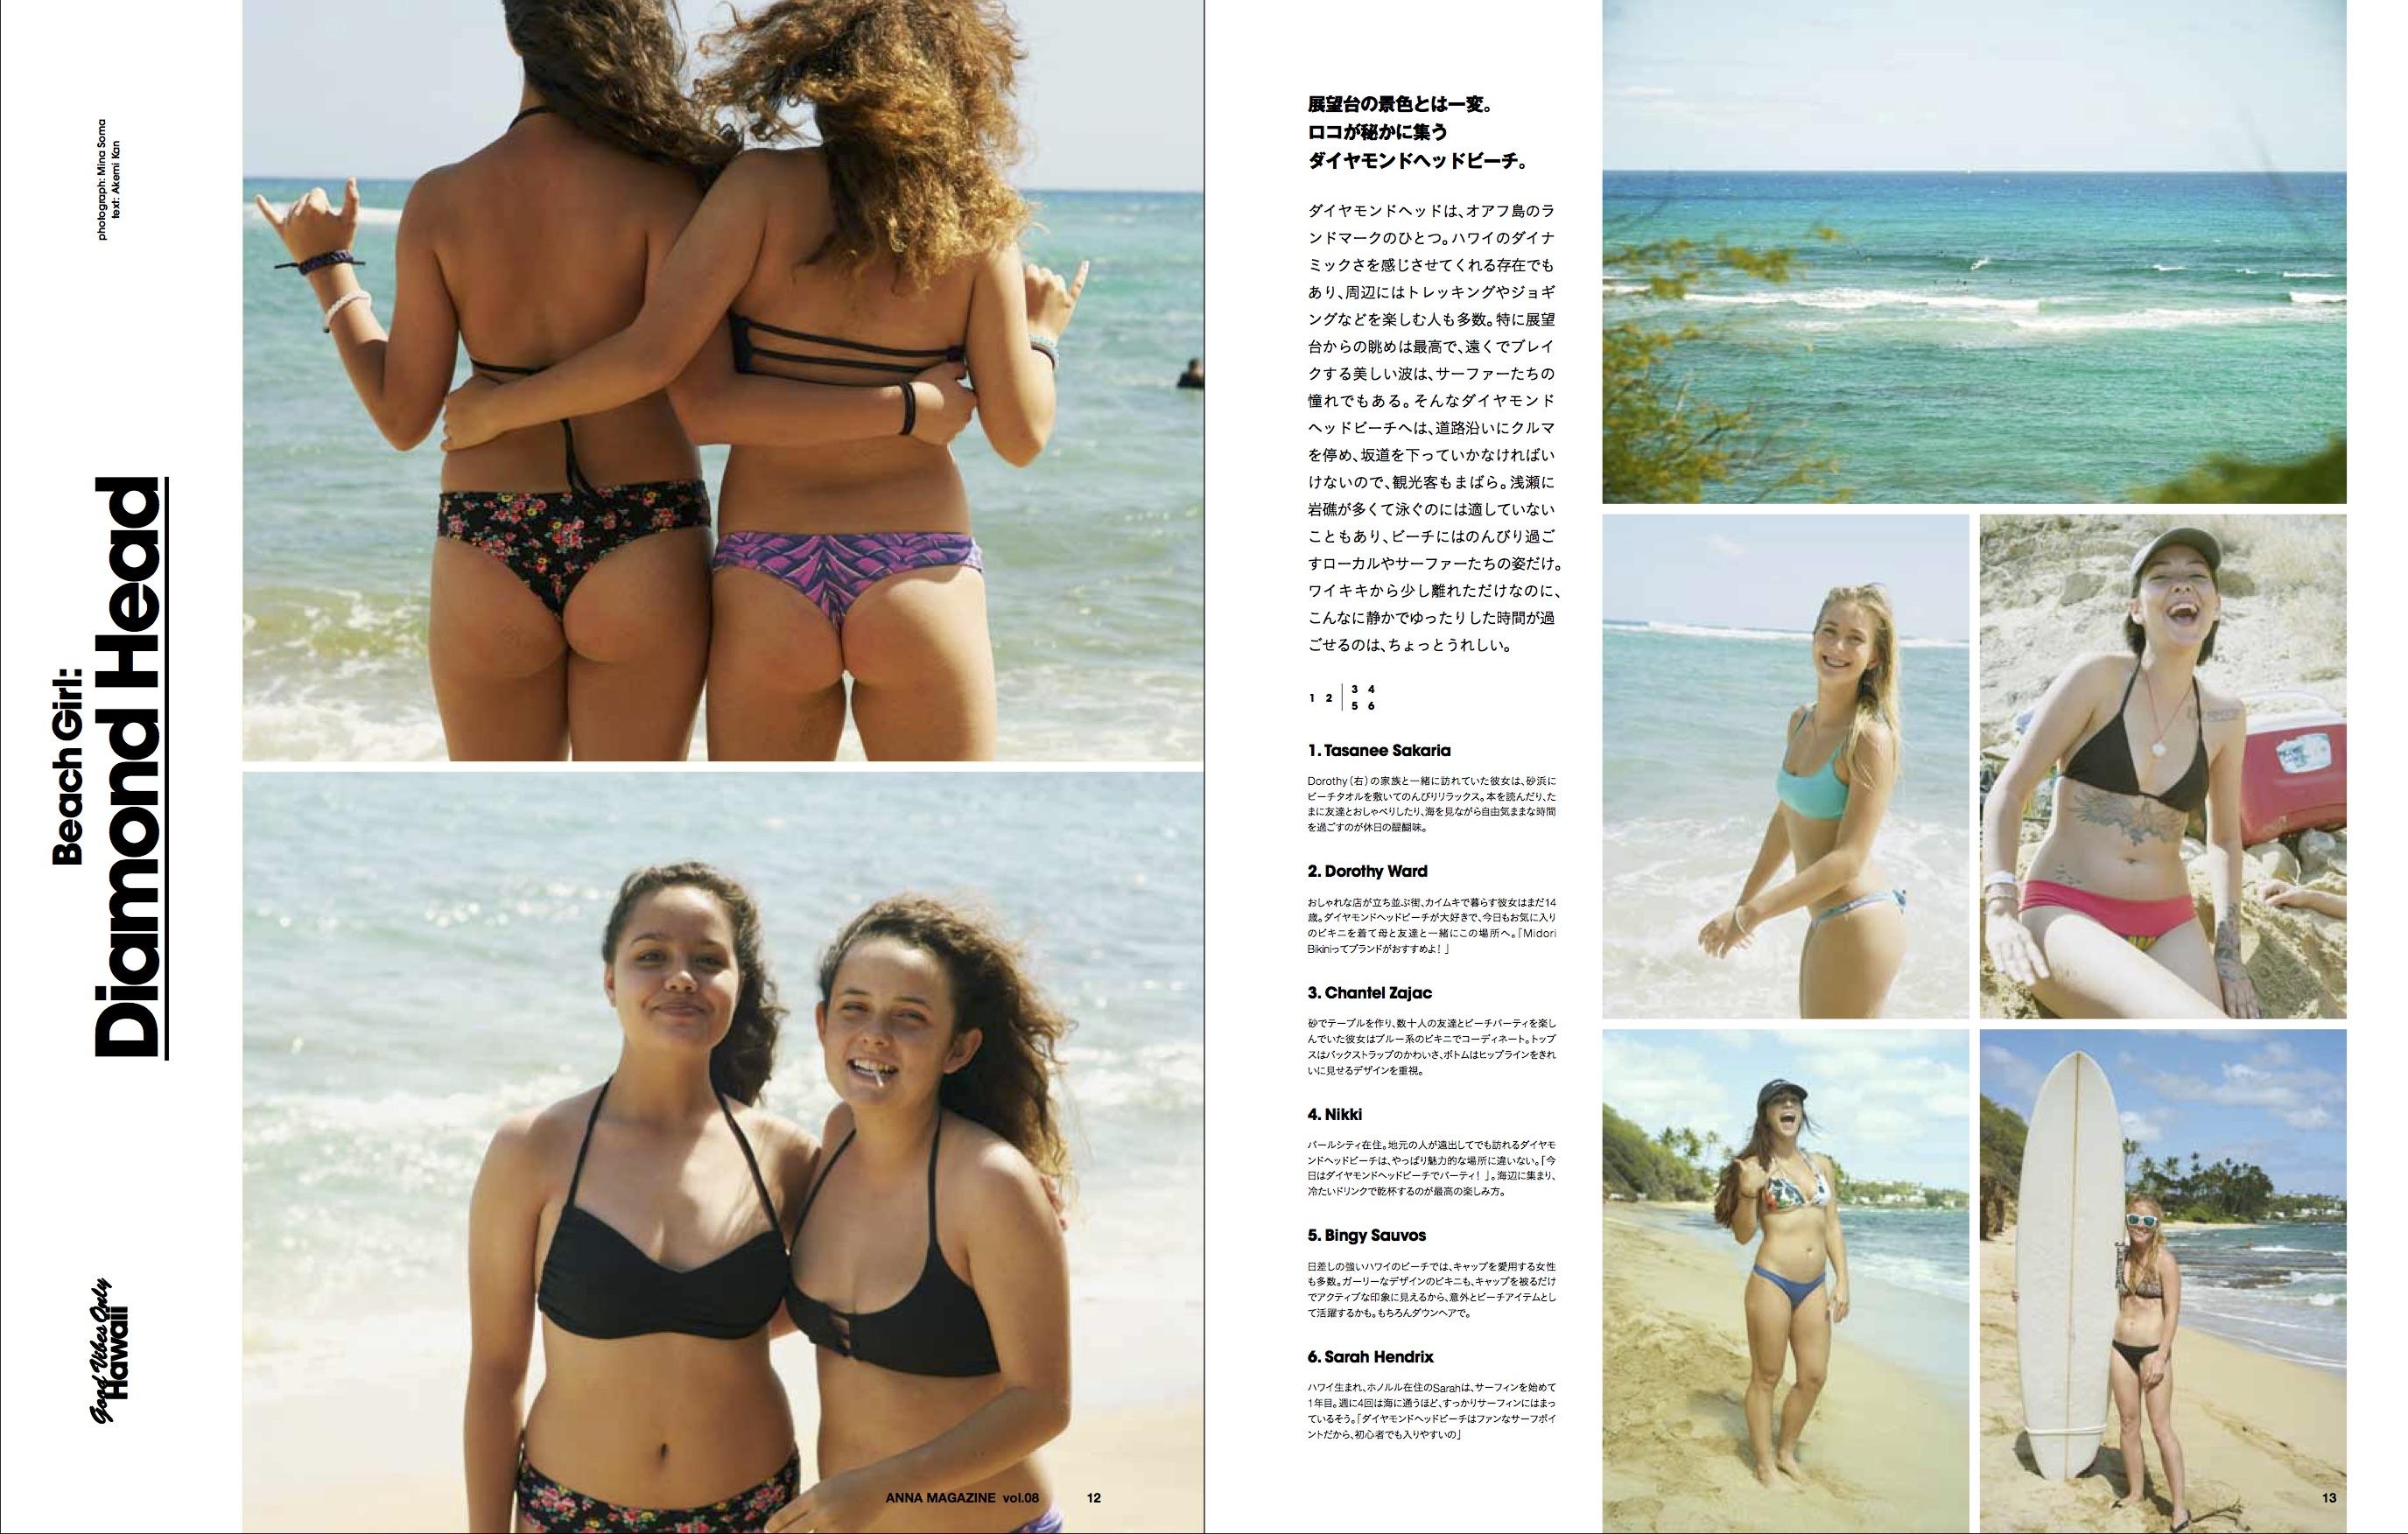 anna magazine vol.8 P5